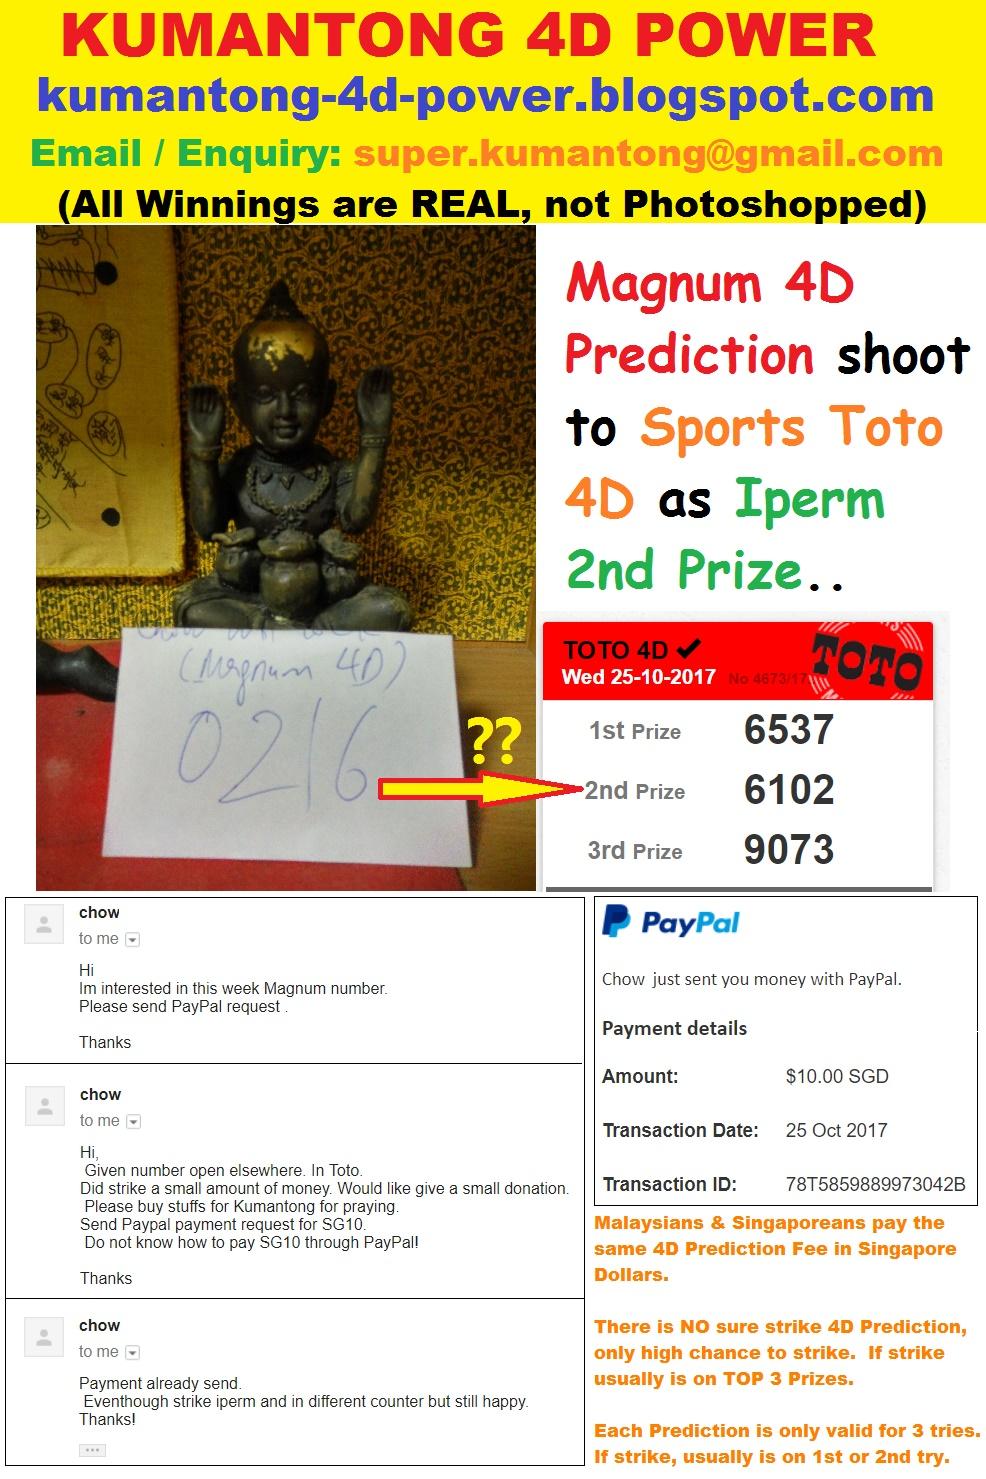 Kumantong 4D Power: Magnum 4D Prediction shoot to Sports Toto 4D ...